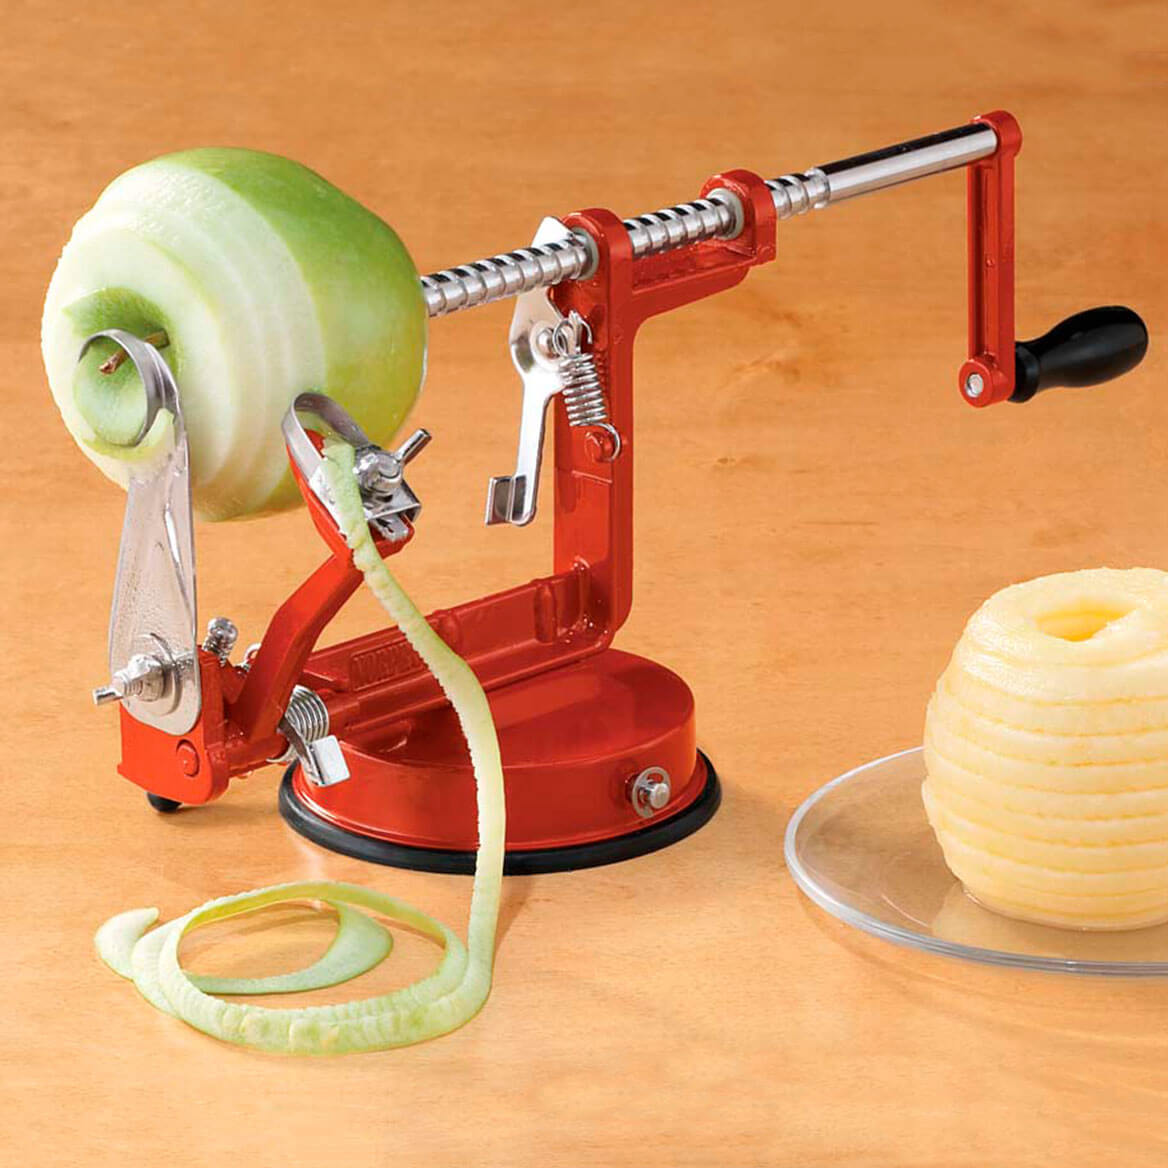 Товары для кухни Яблокочистка «Apple Peeler Corer Slicer» alt_304735_1_2x.jpg